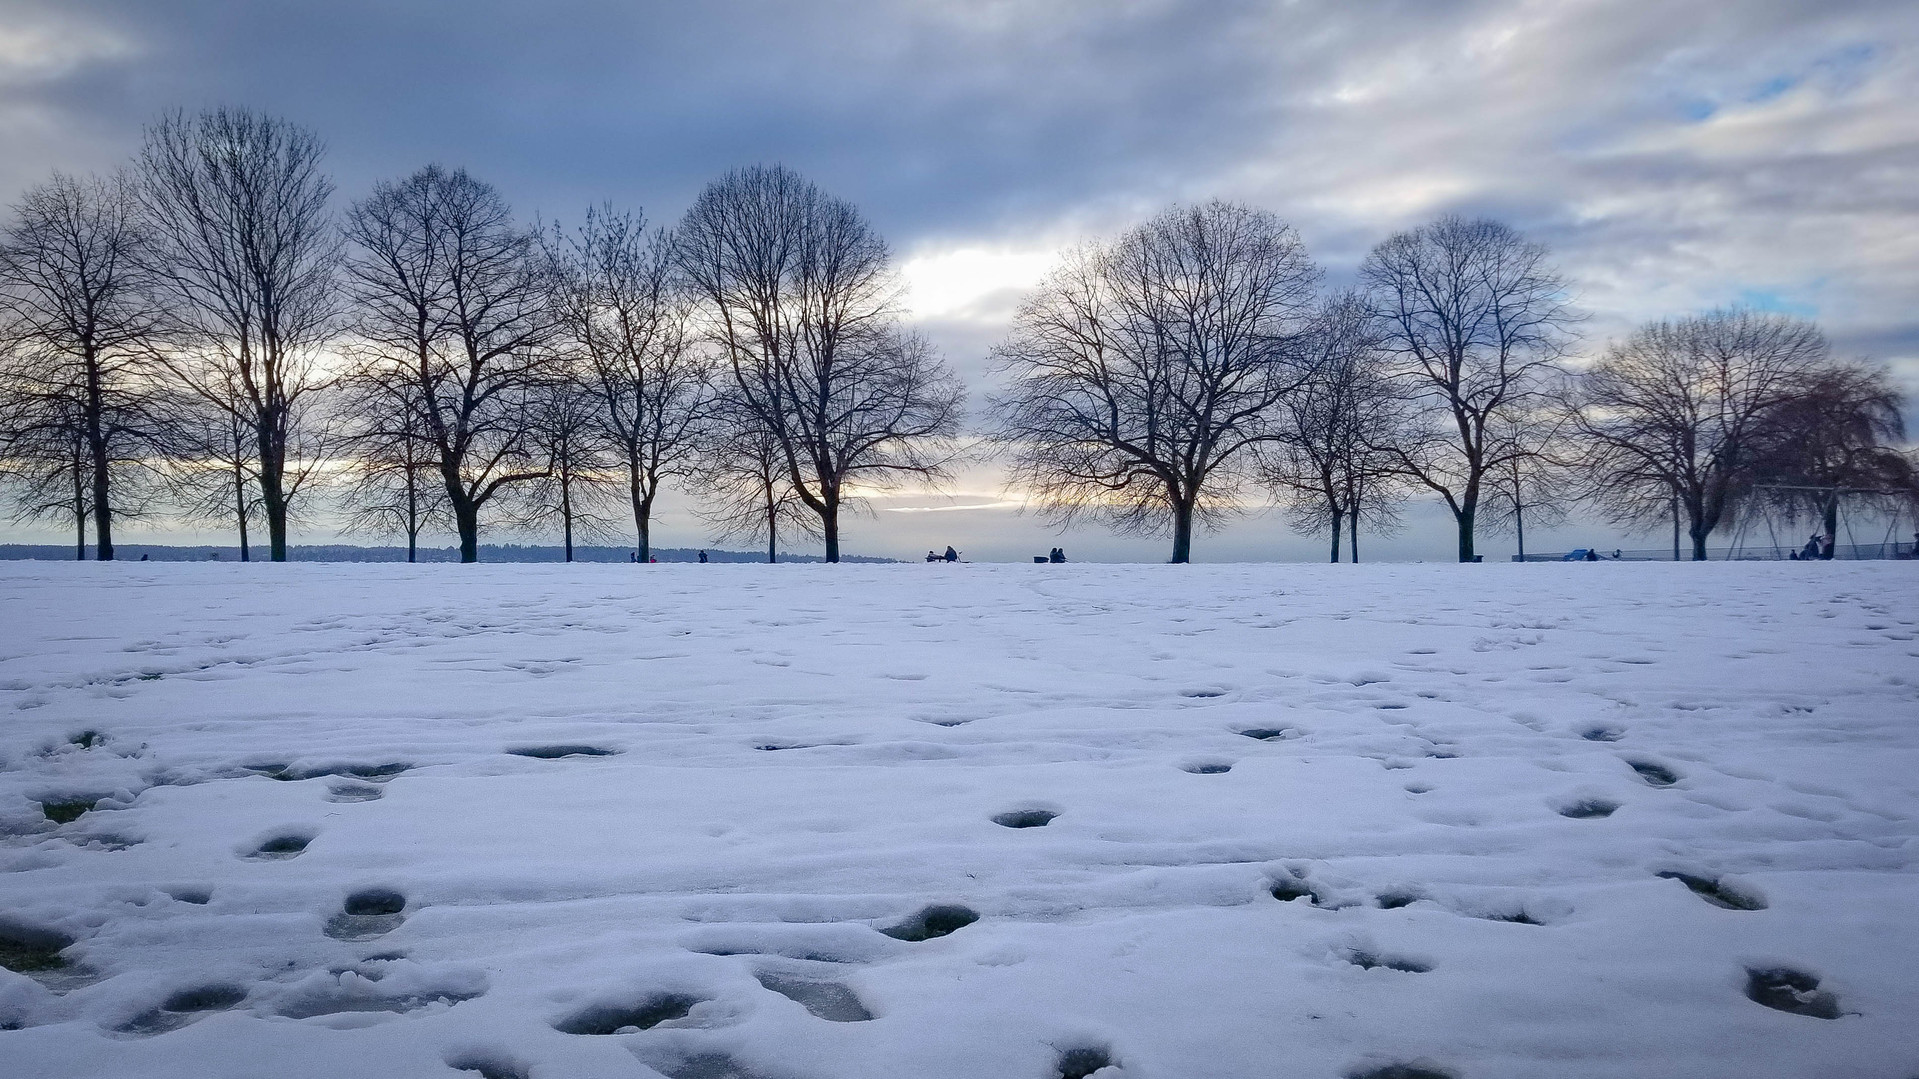 Snowy Beaches